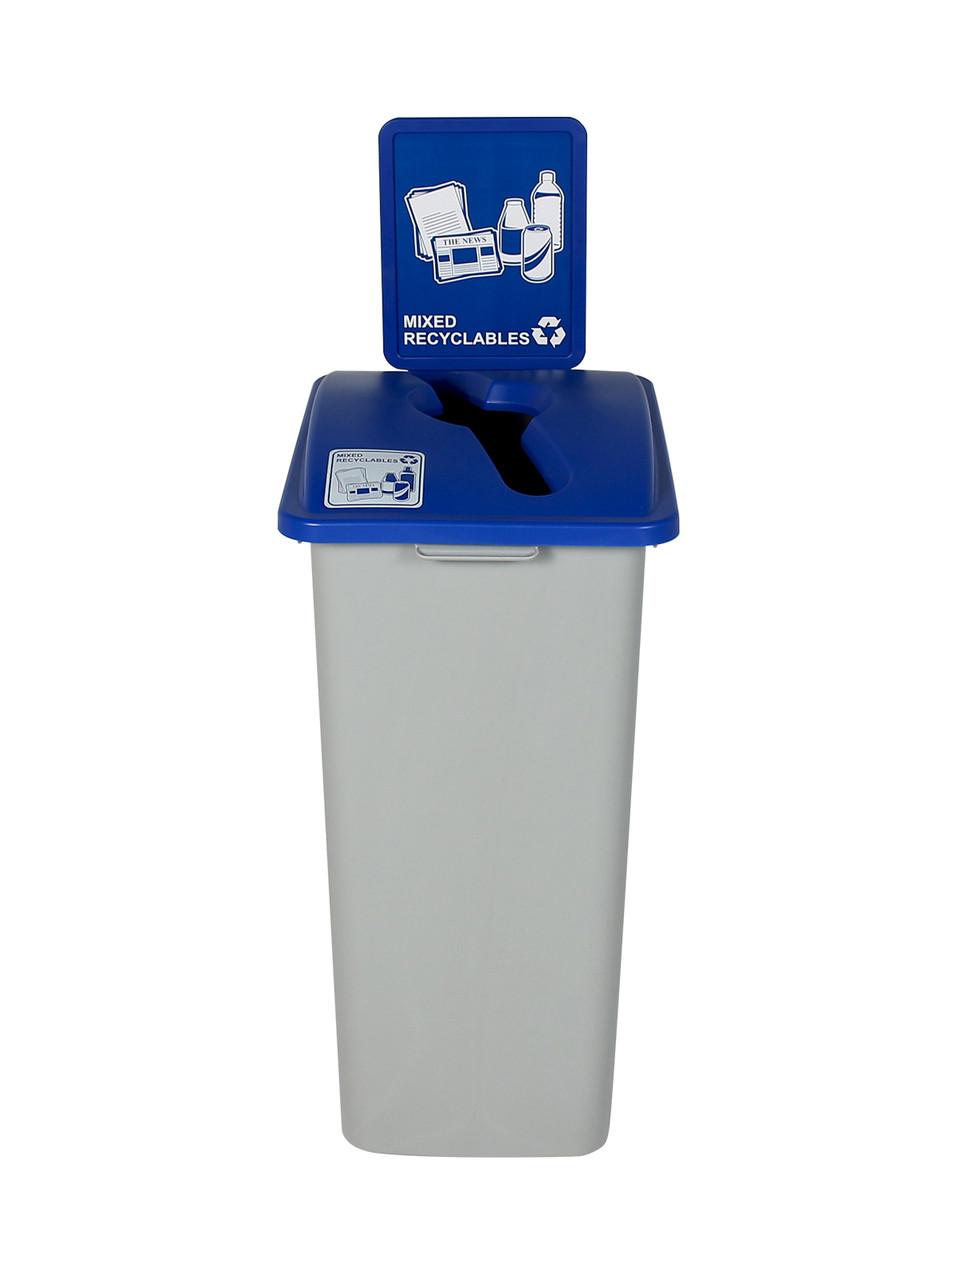 32 Gallon Plastic XL Single Home & Office Recycling Bin WWXL (4 Colors)